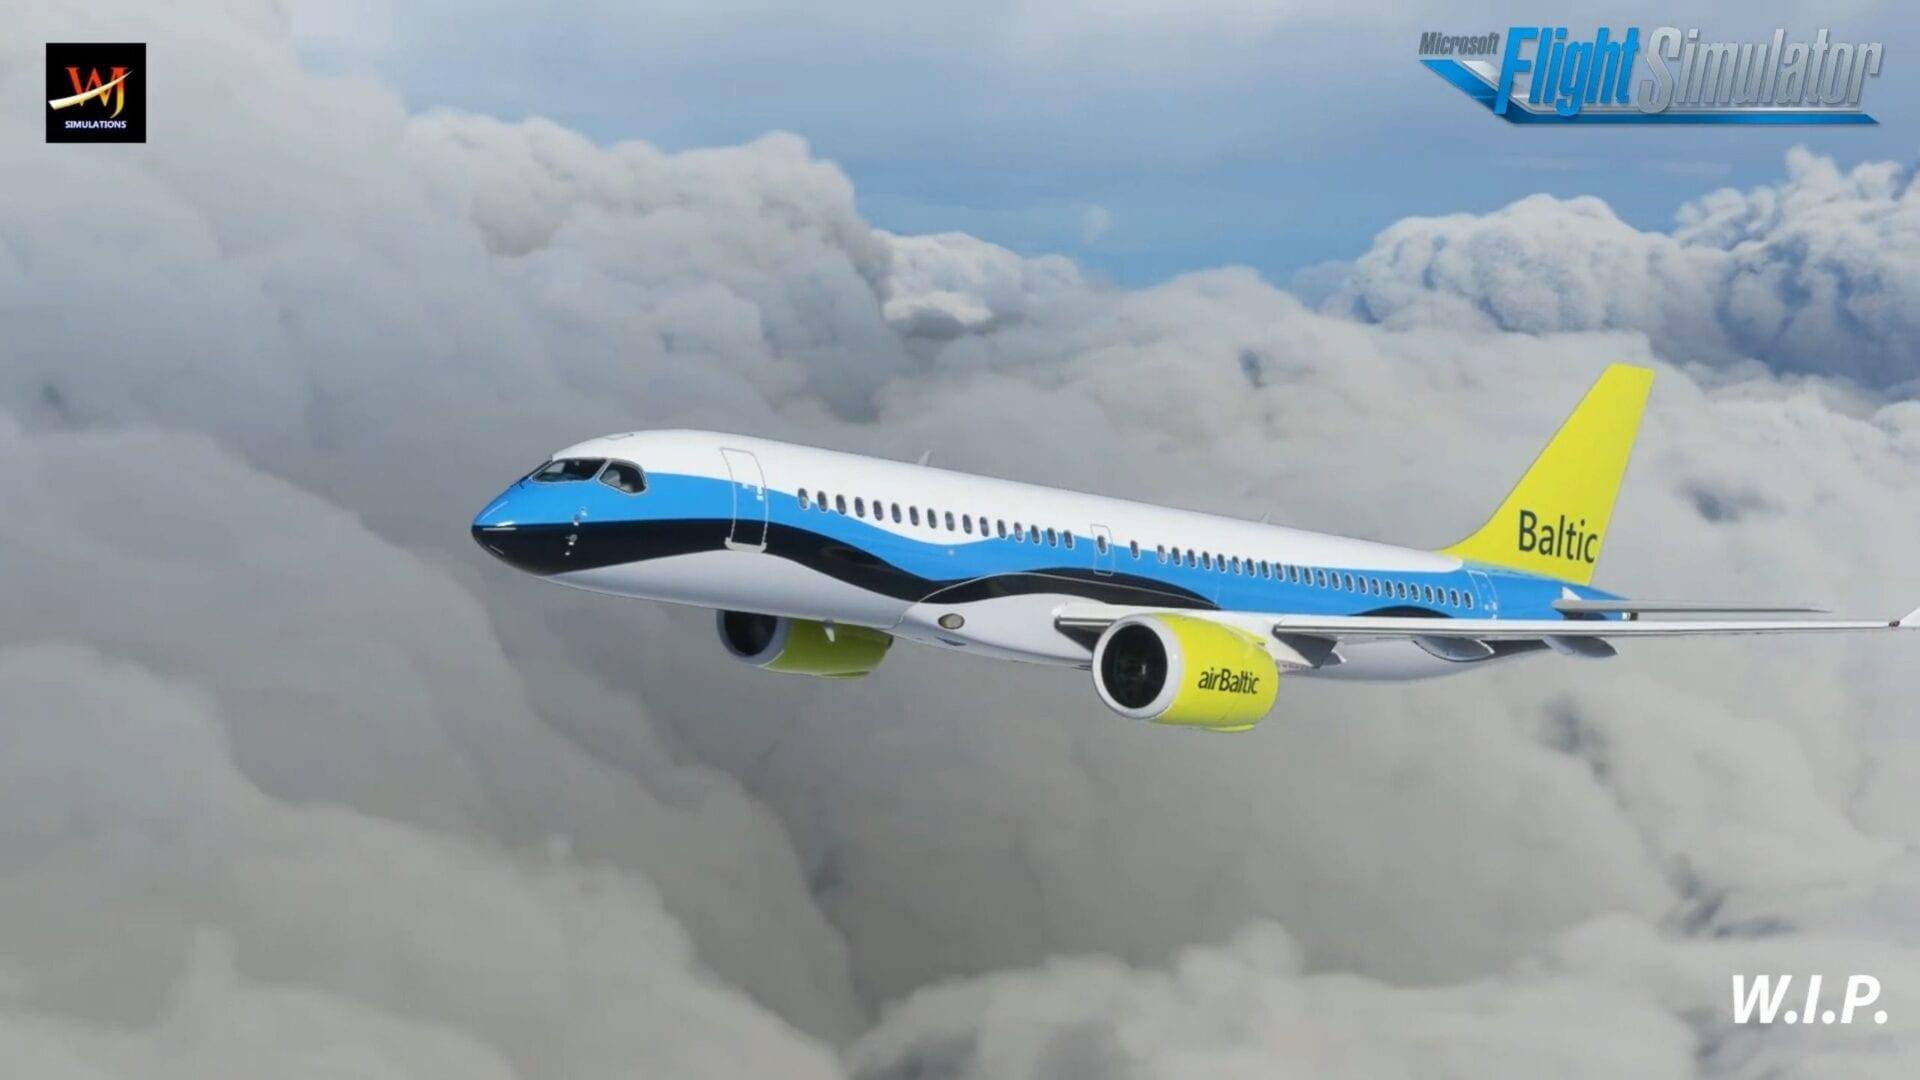 Microsoft Flight Simulator Airbus A220